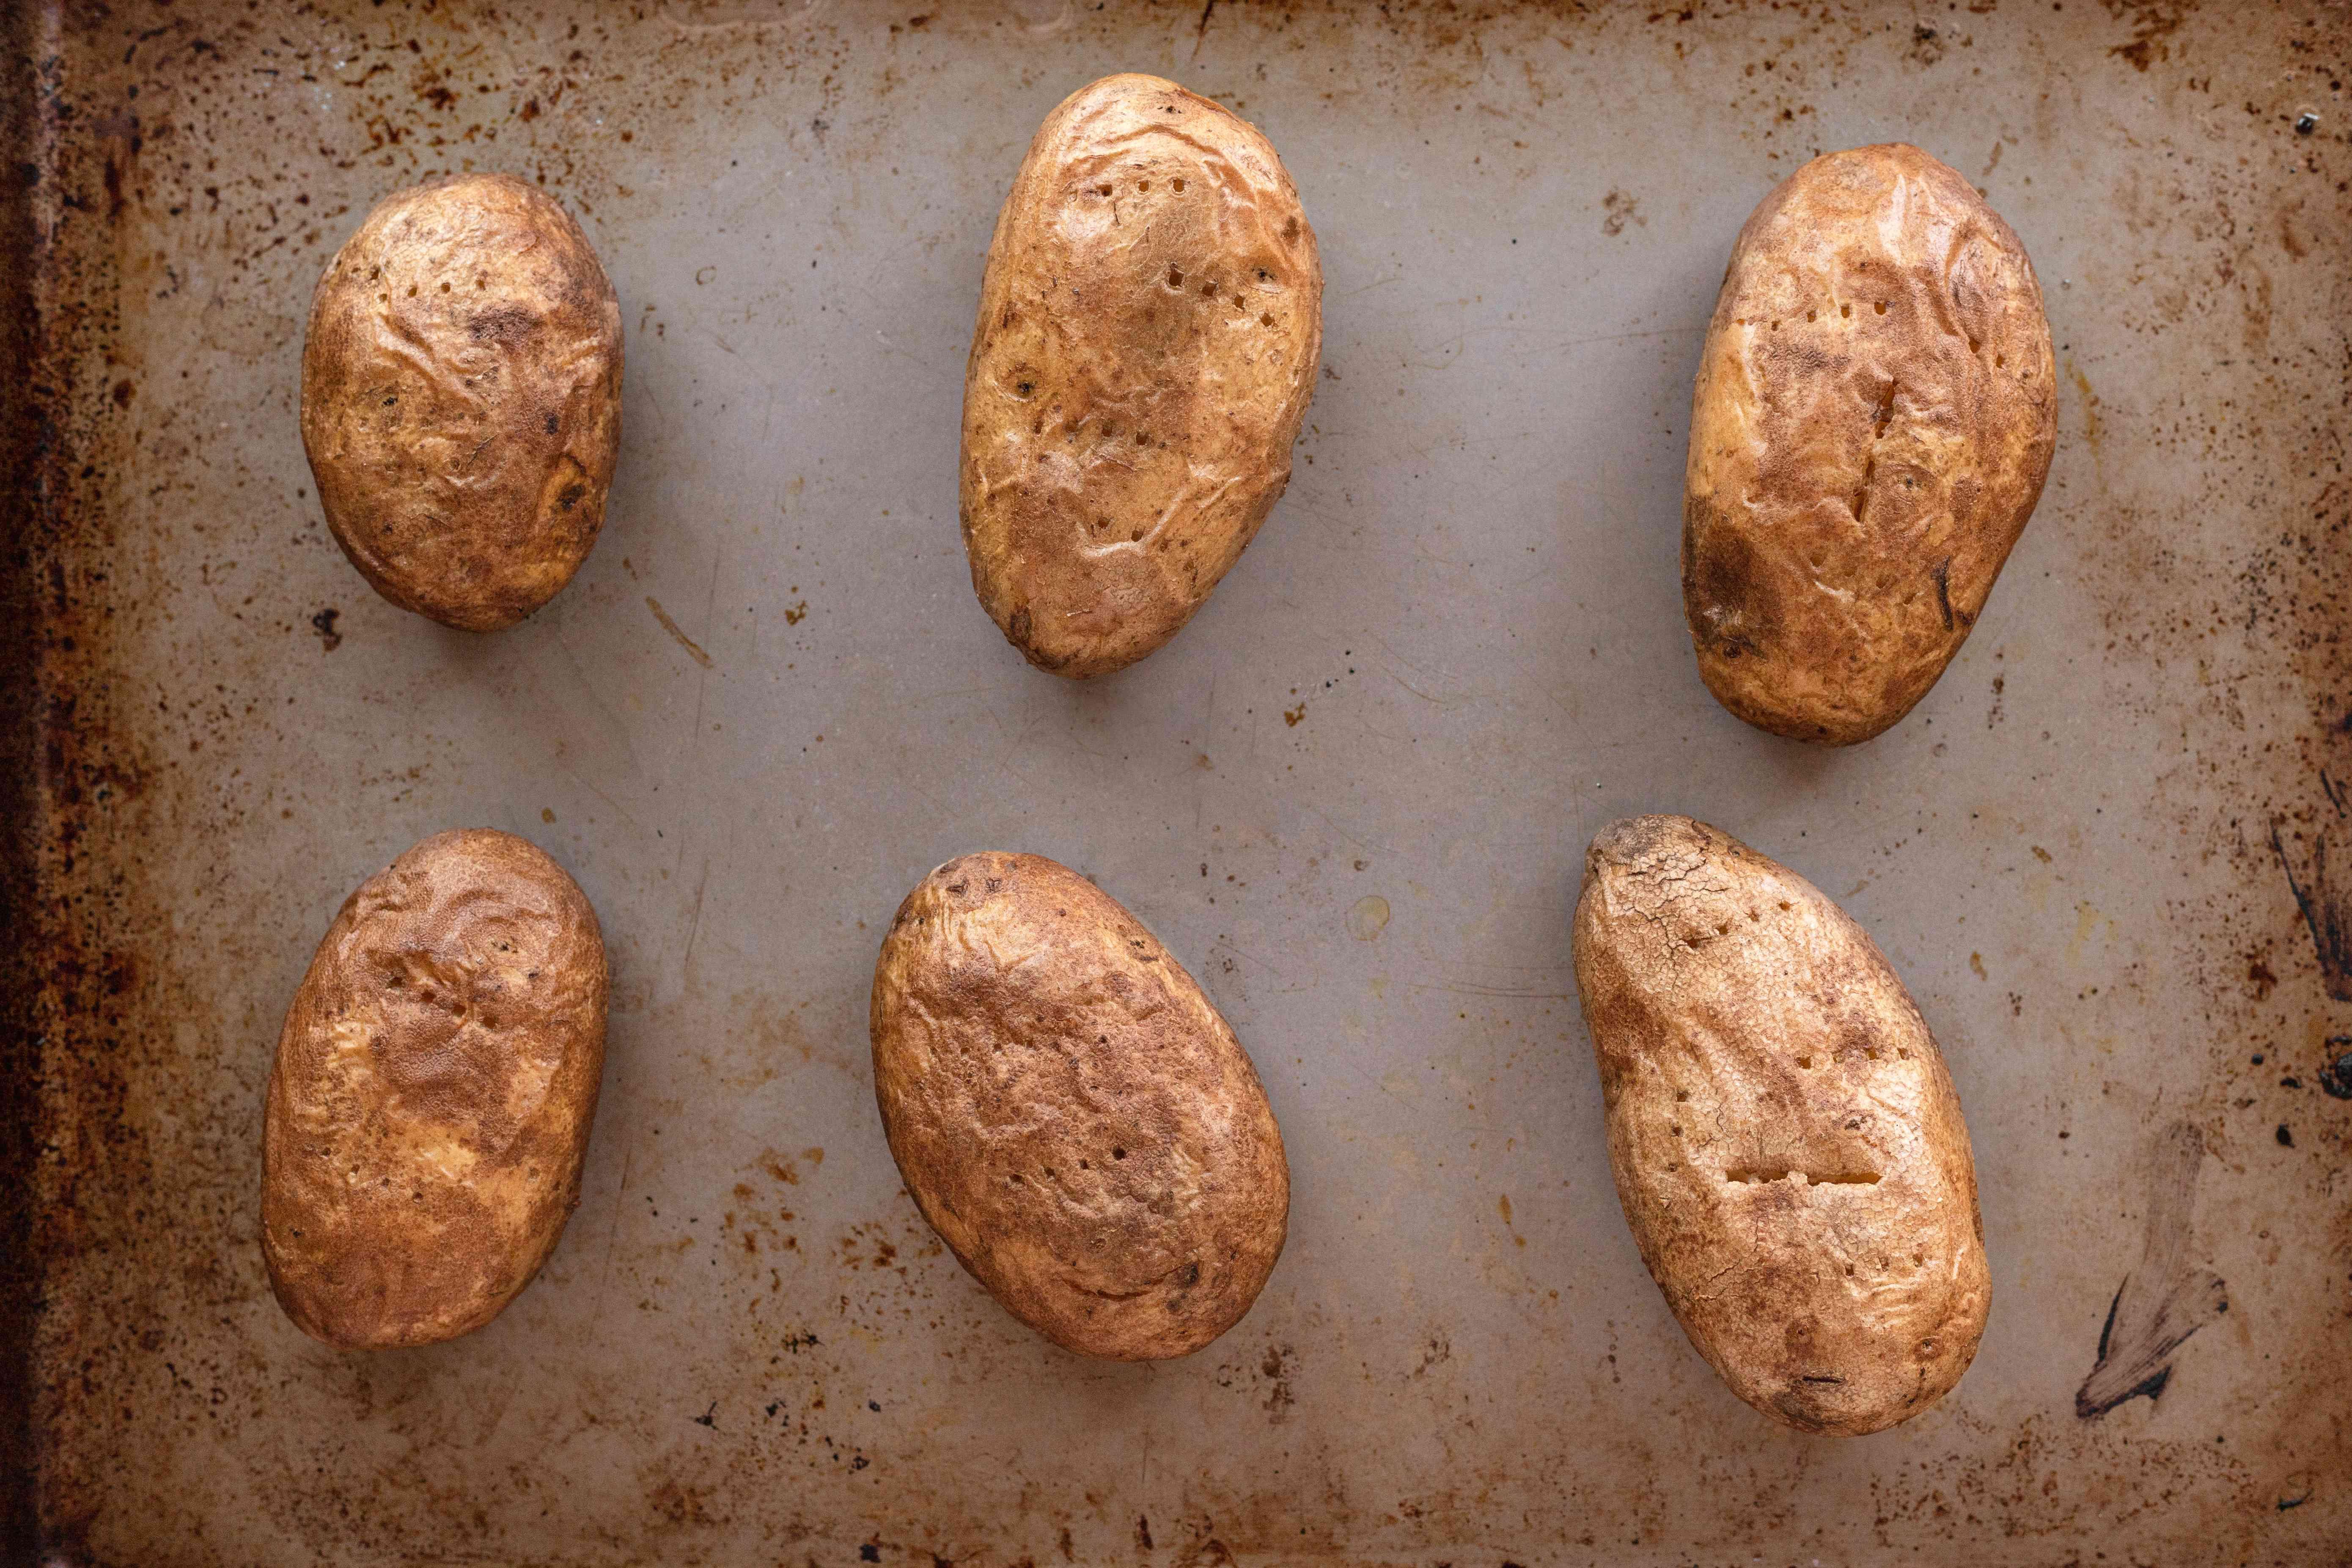 Potatos halved on a baking sheet to make a potato skins recipe.